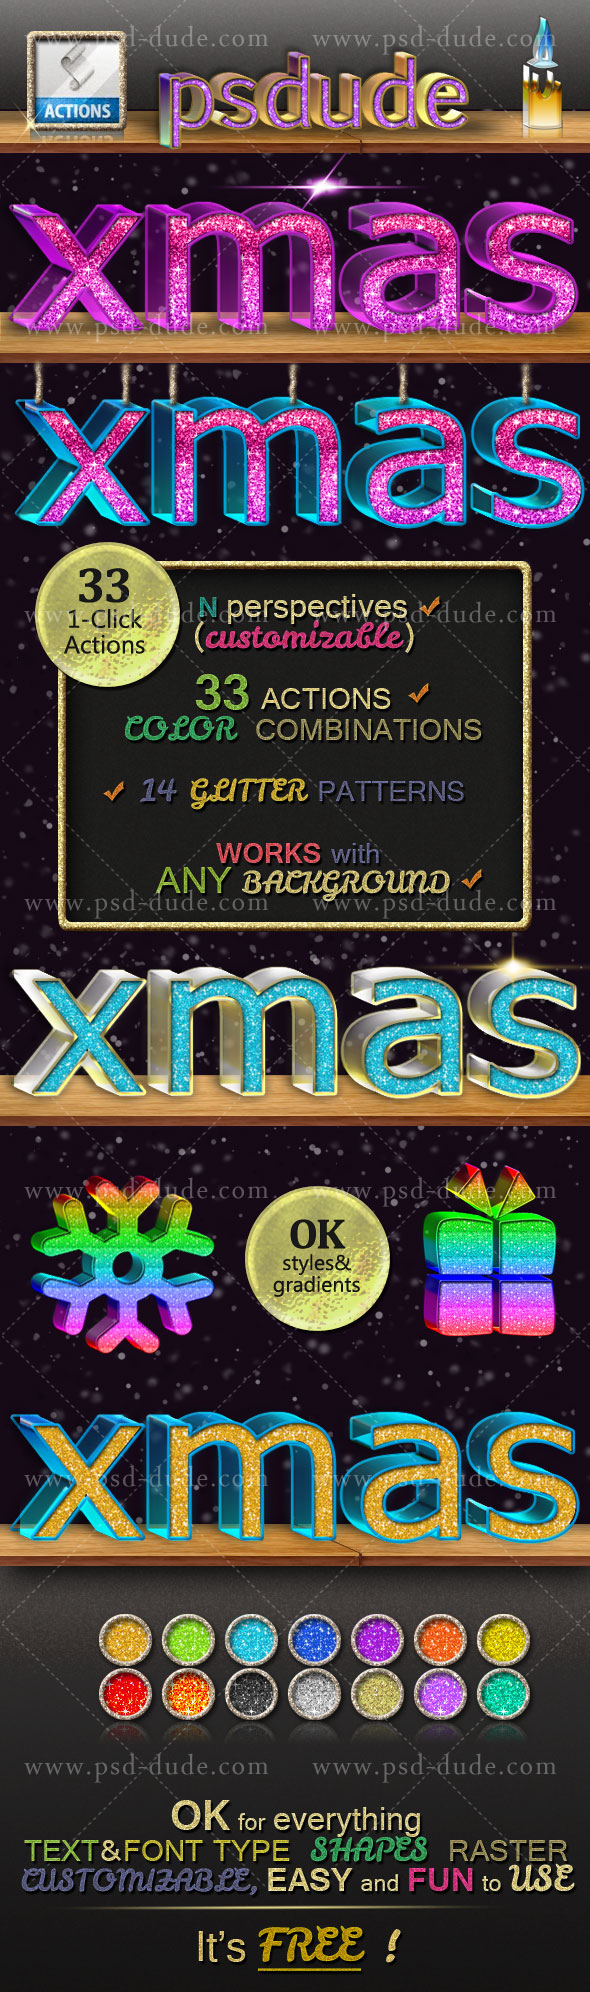 3D Glitter Photoshop Style Action Generator | PSDDude